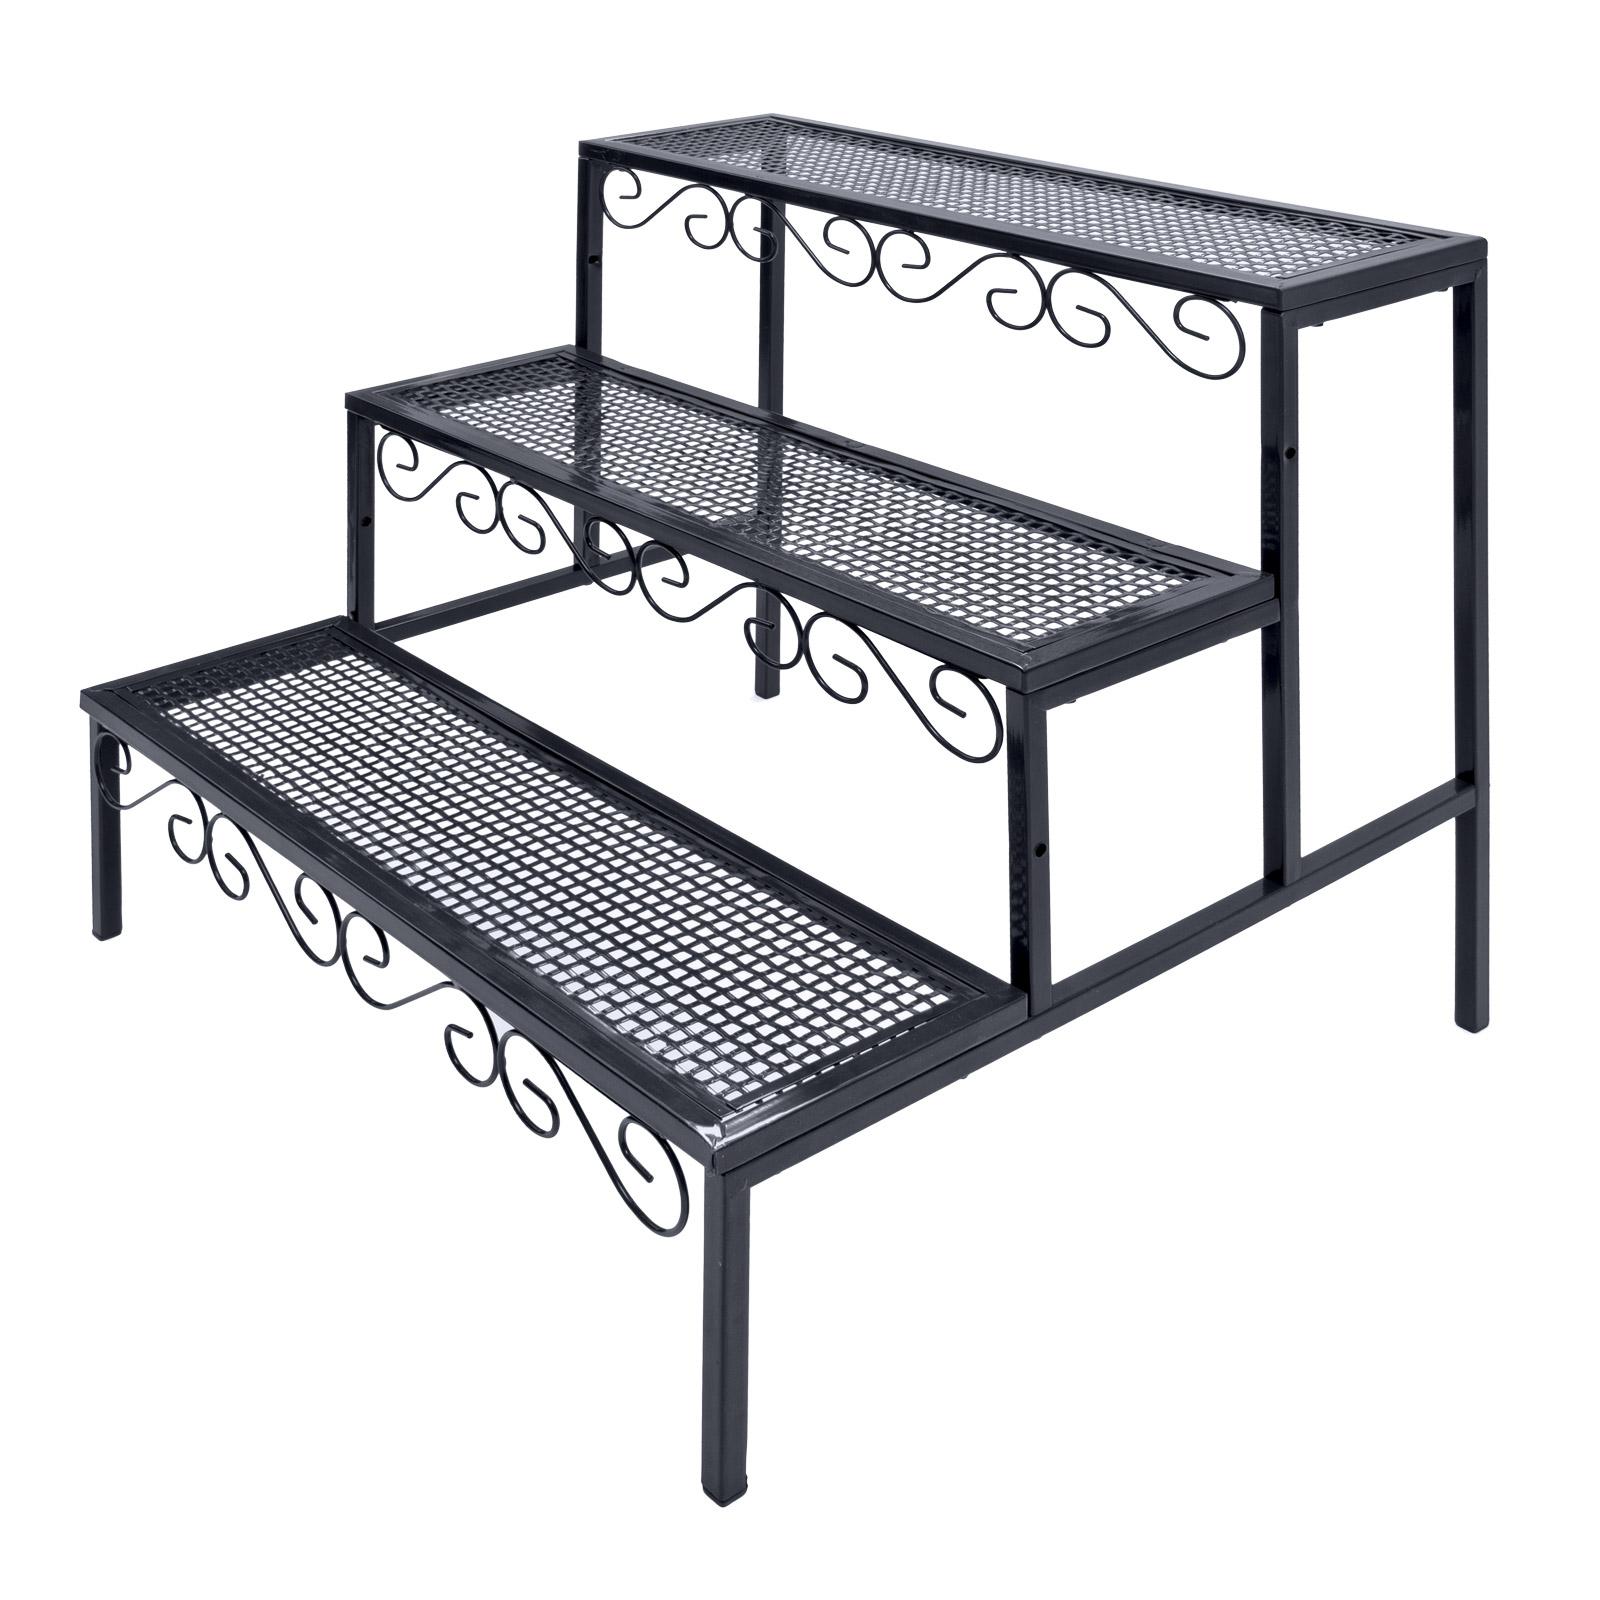 regal treppe pflanztreppe standregal pflanzregal b cherregal 3stufen 918429 ebay. Black Bedroom Furniture Sets. Home Design Ideas